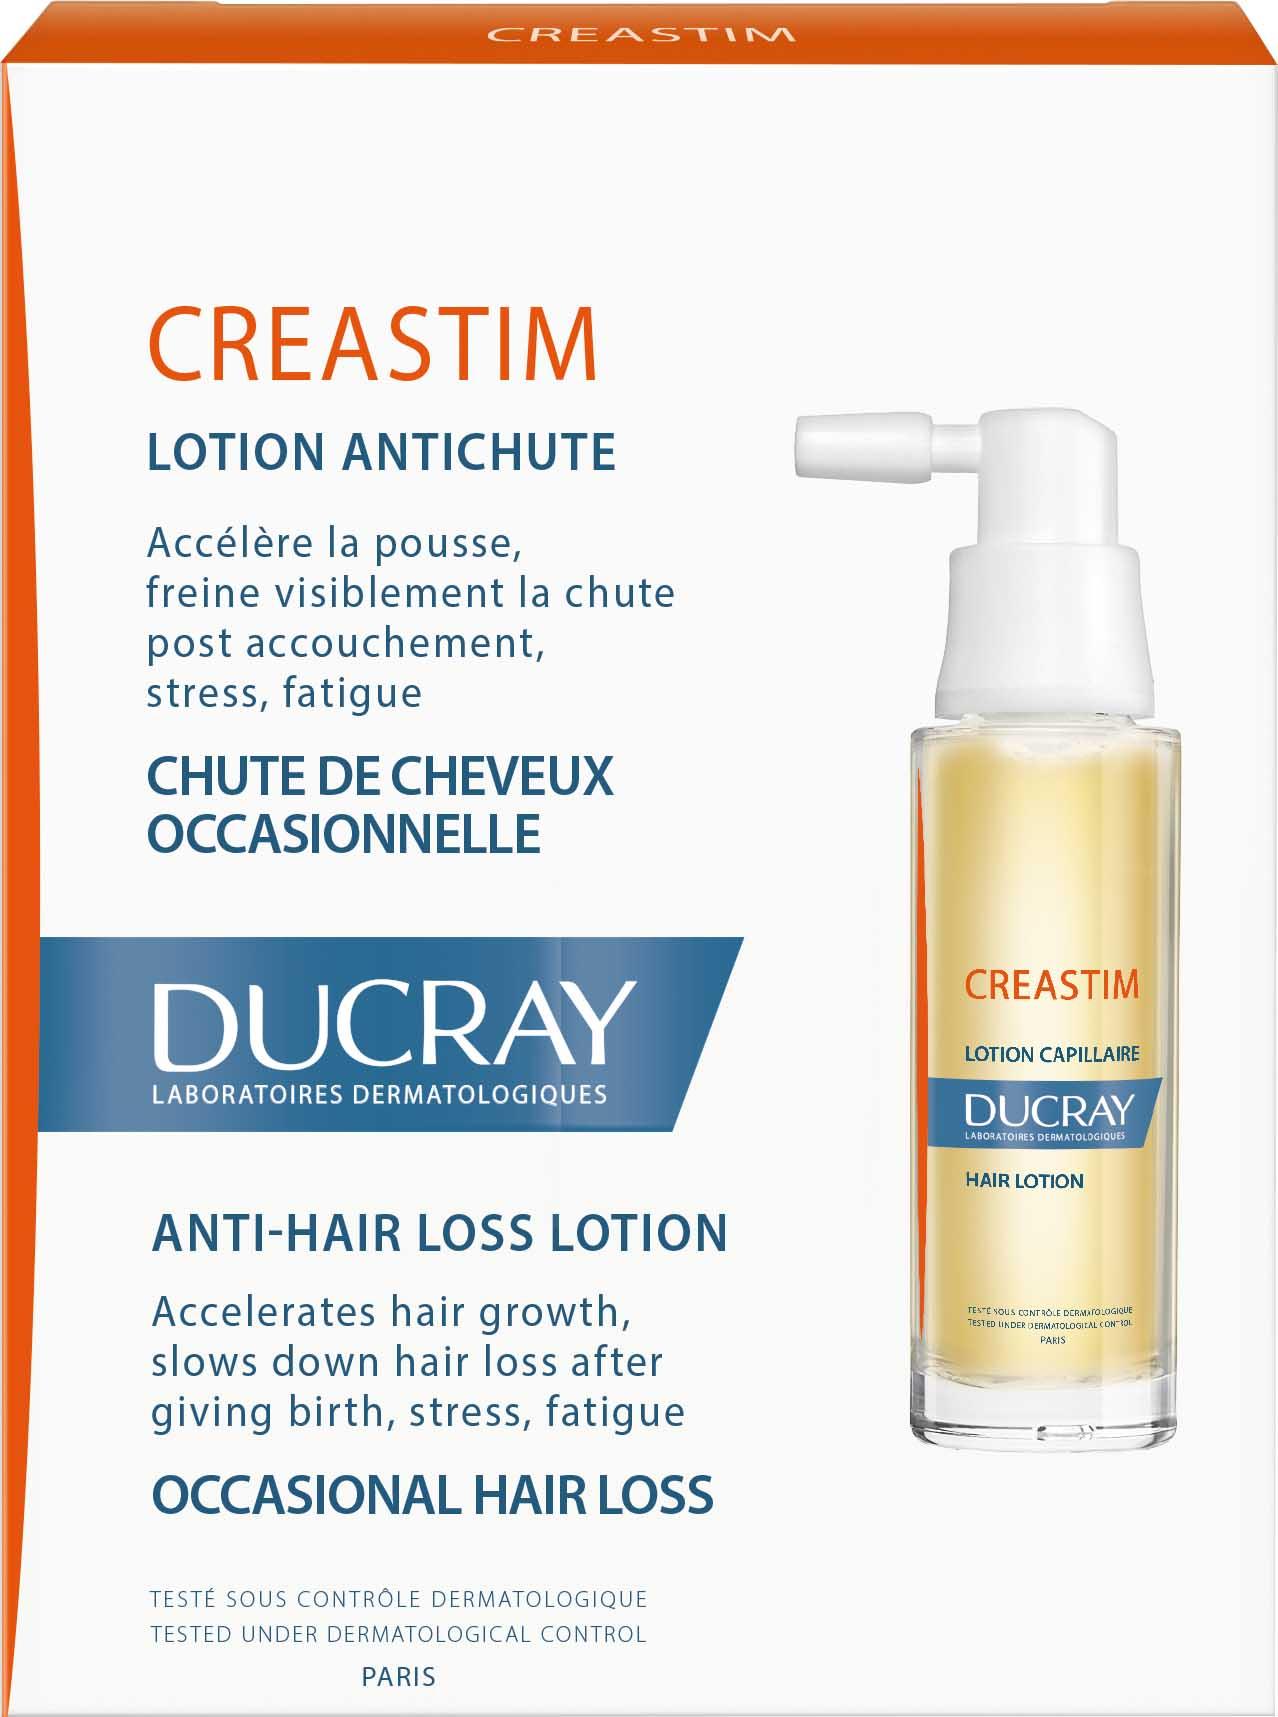 Ducray Creastim Lotion (PROMO -15%) Λοσιόν Αγωγής κατά της Αντιδραστική Τριχόπτωσης, 2 x 30ml